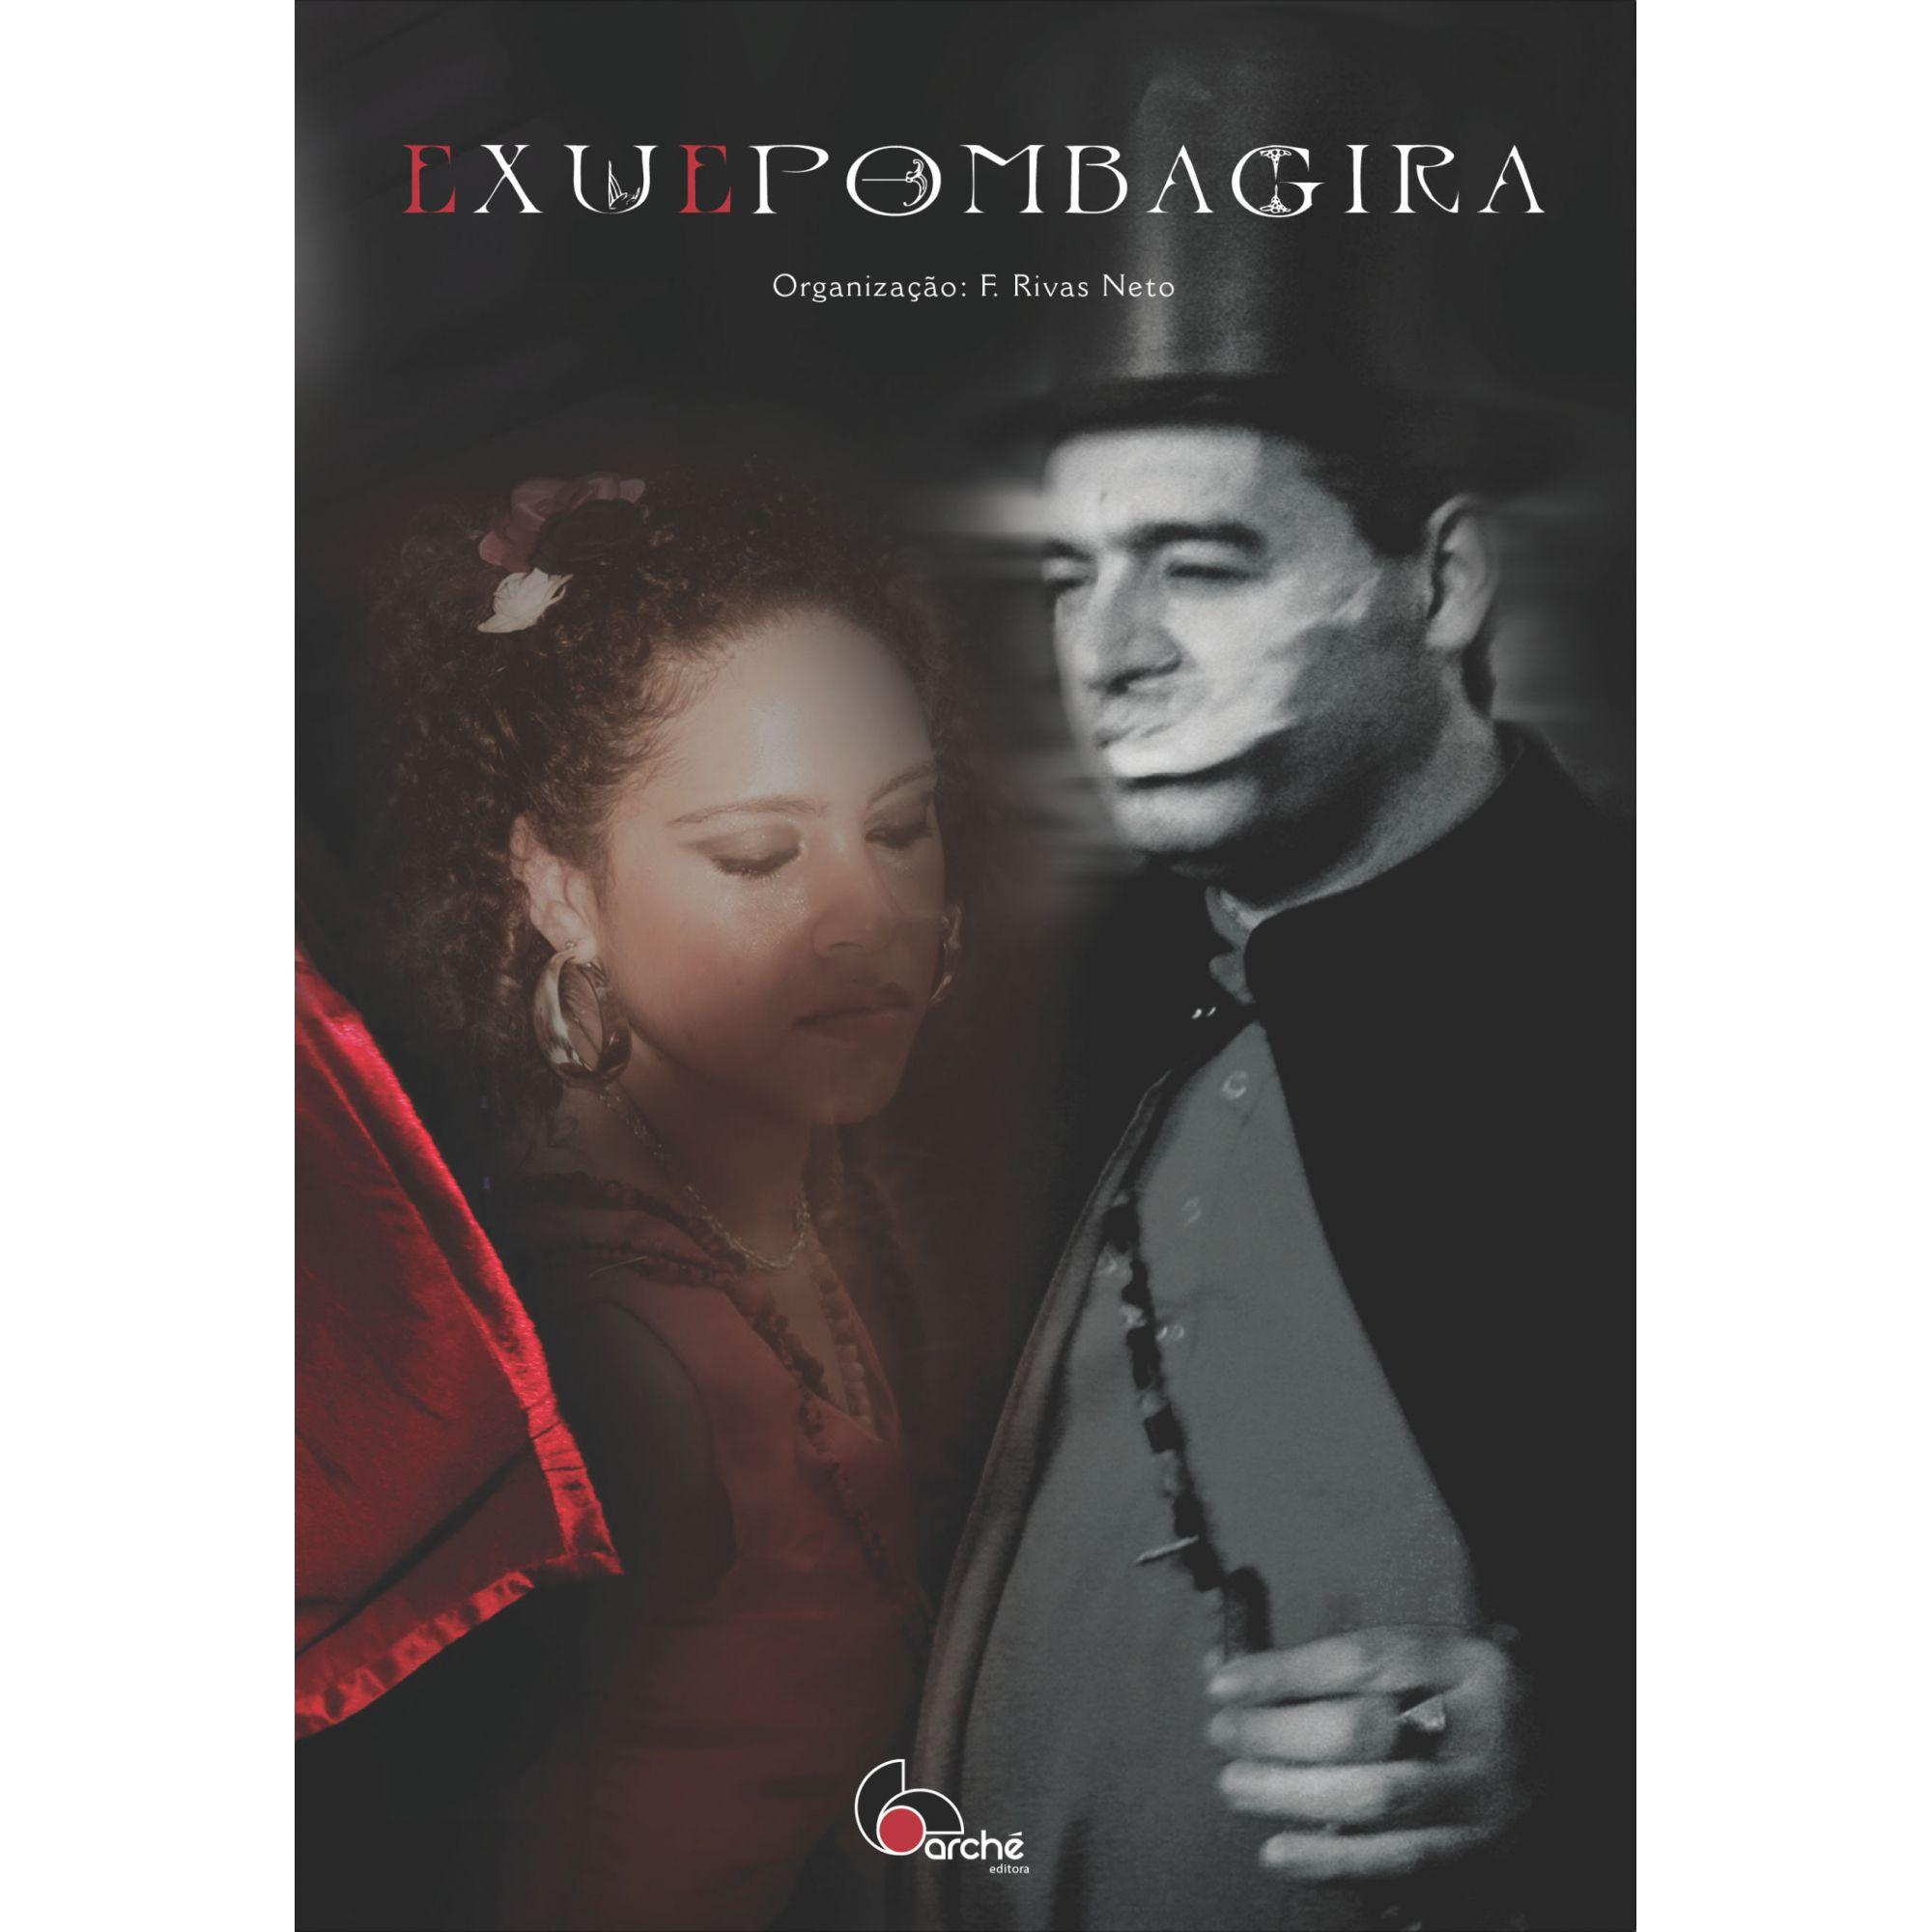 EXU E POMBAGIRA